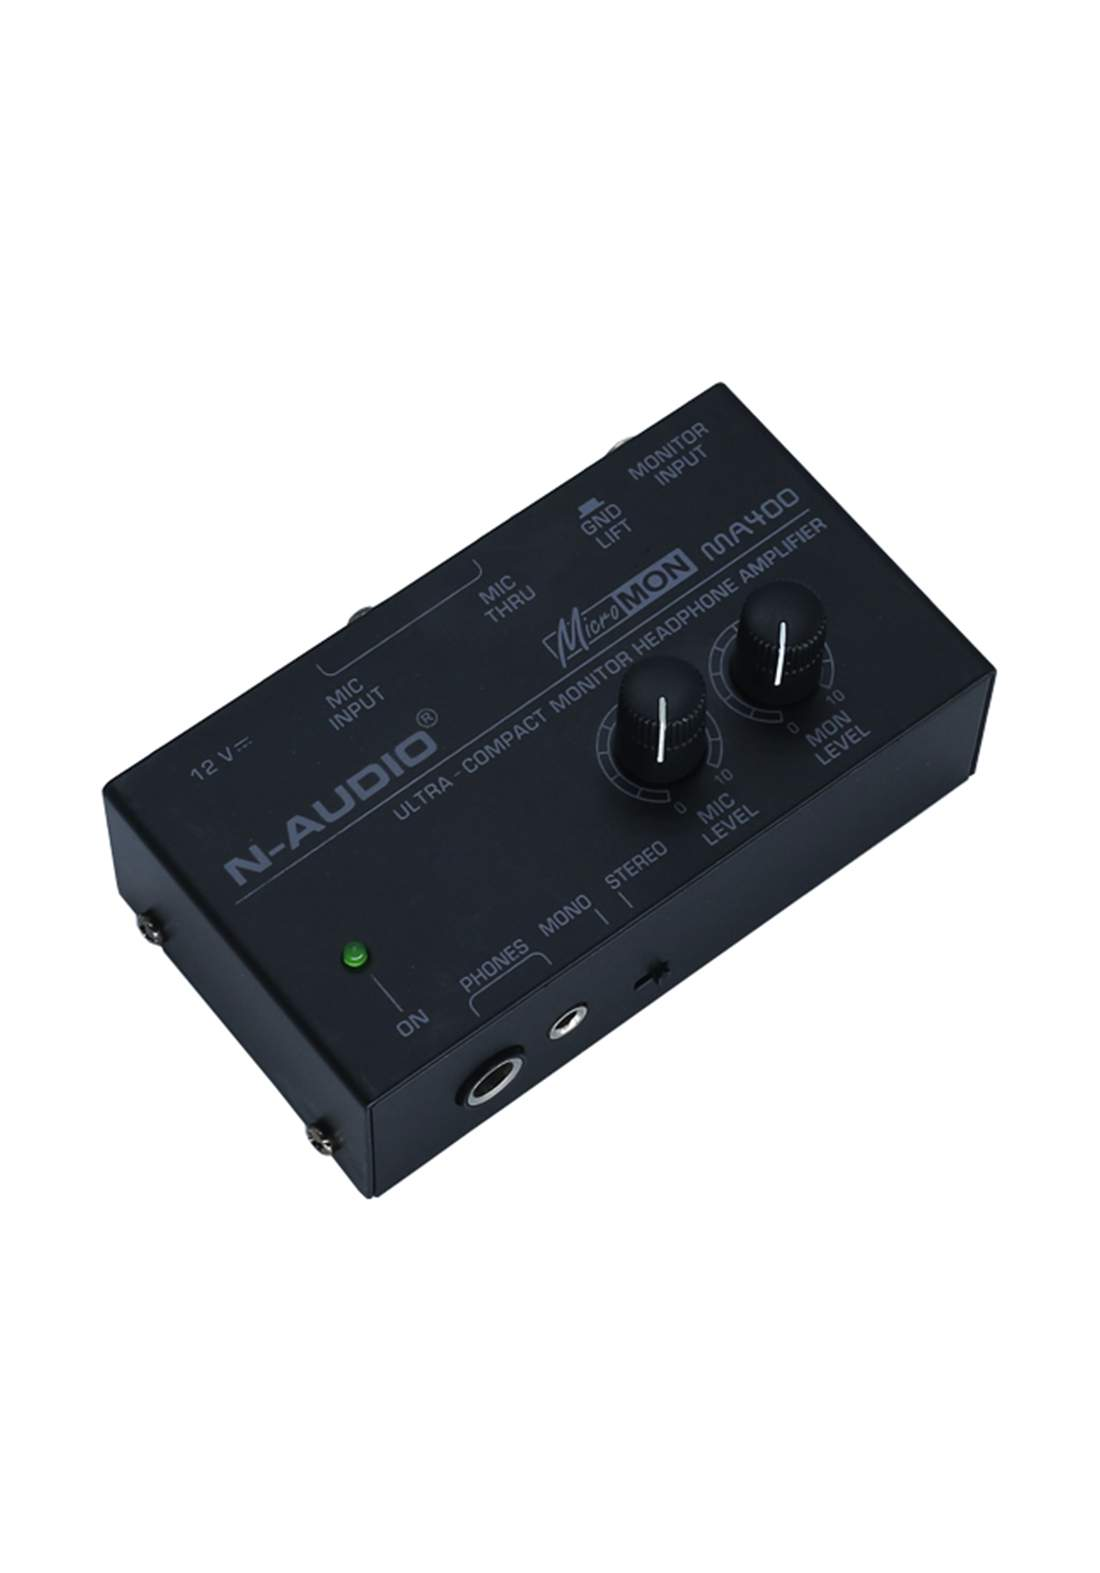 N-audio MA400 Monitor Headphone Amplifier-Black